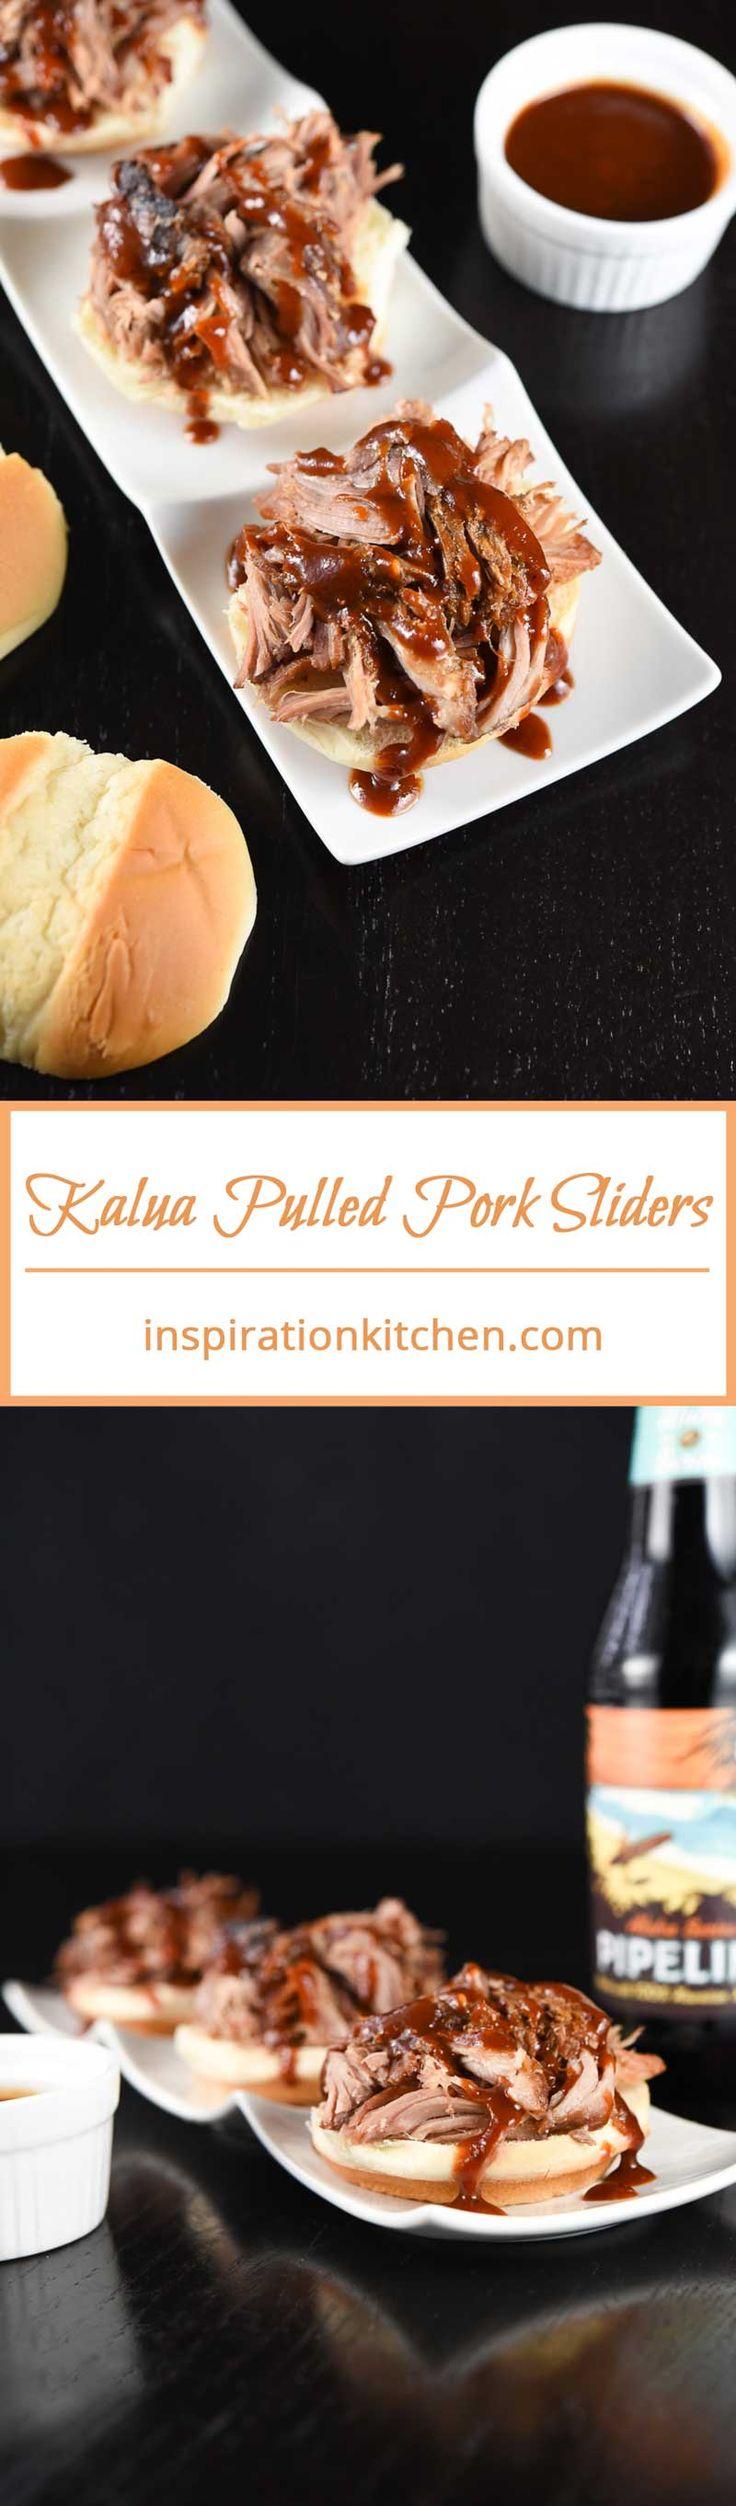 Kalua Pulled Pork Sliders   Inspiration Kitchen